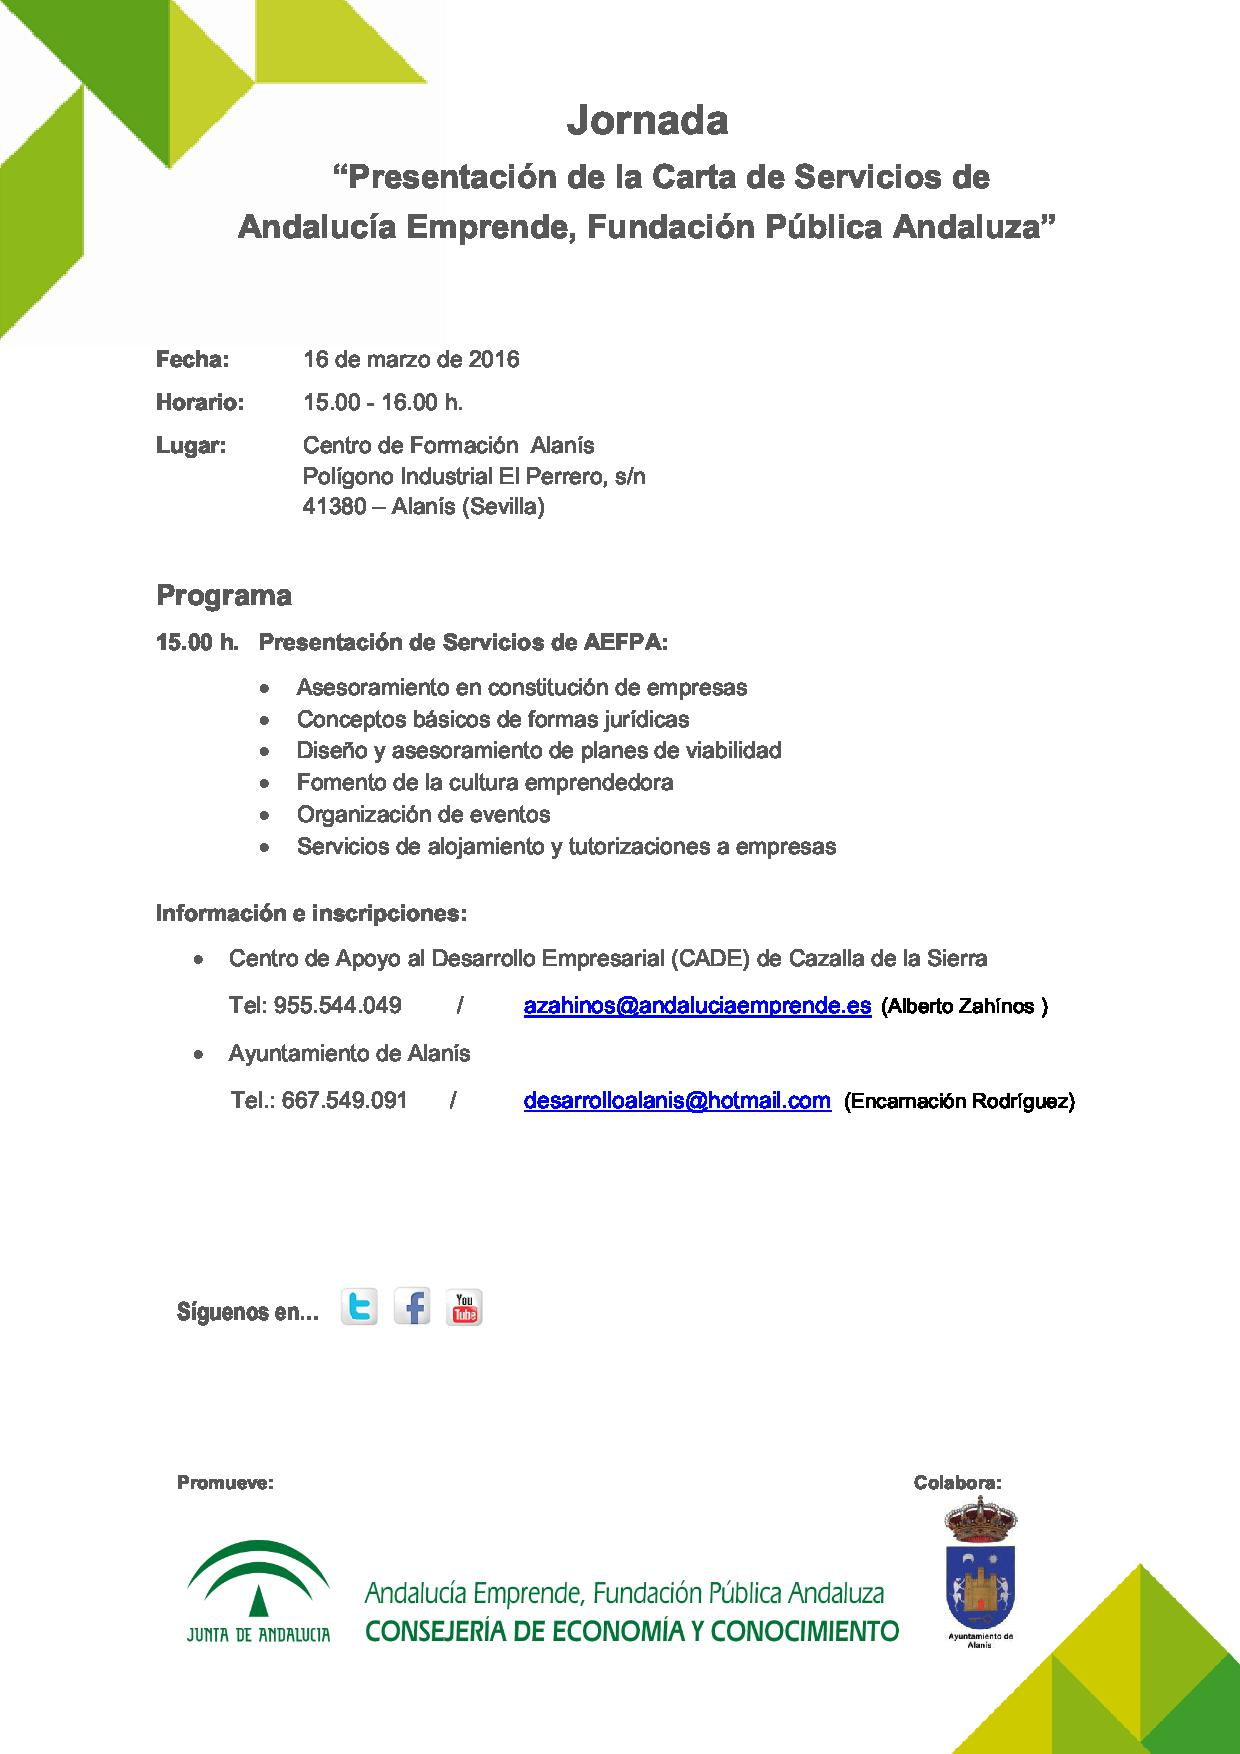 Jornada Presentacion De La Carta De Servicios De Andalucia